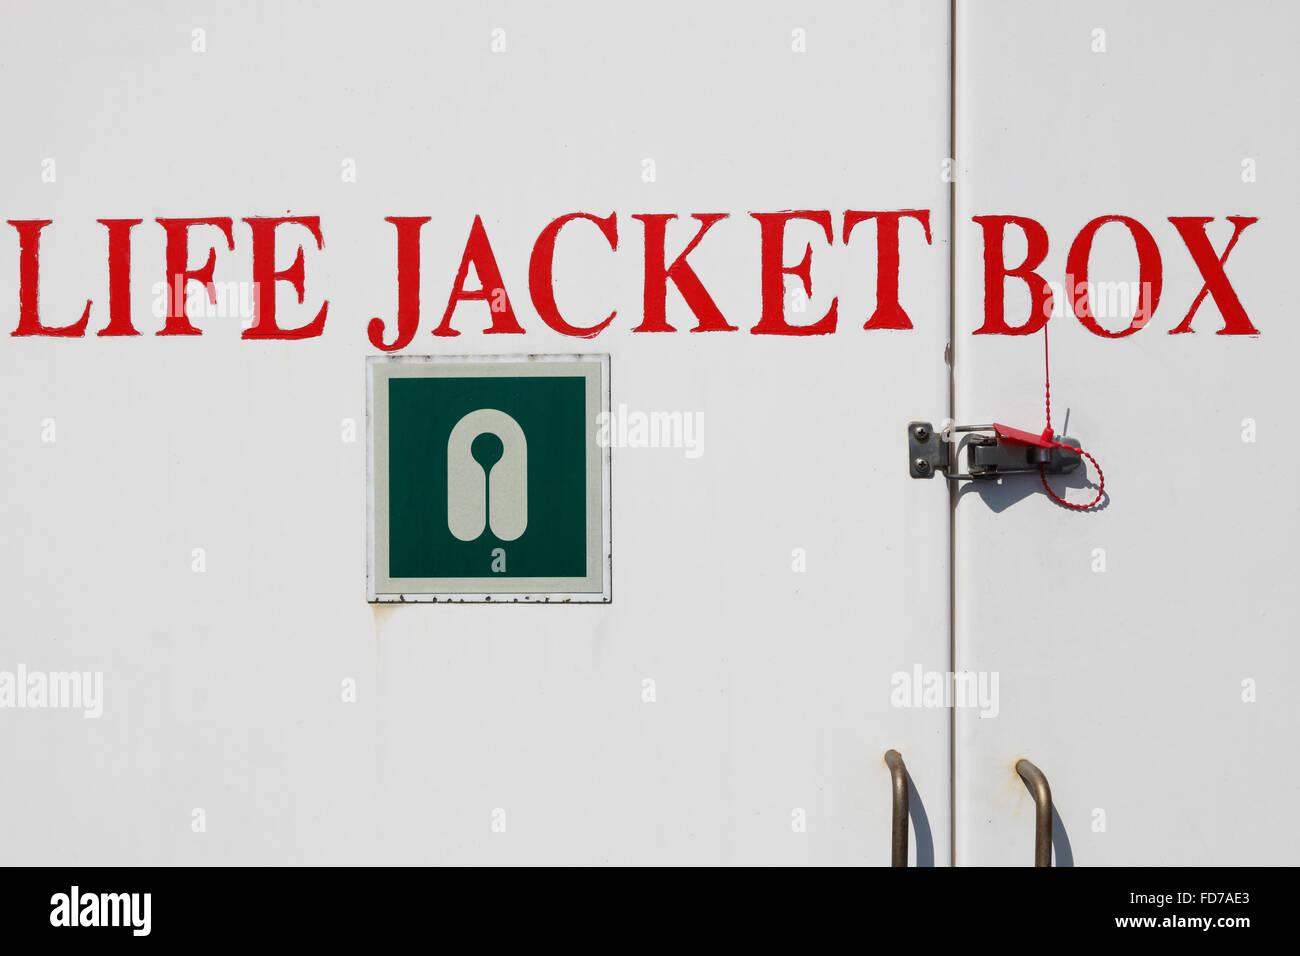 Life Jacket Box on a passenger ship - Stock Image